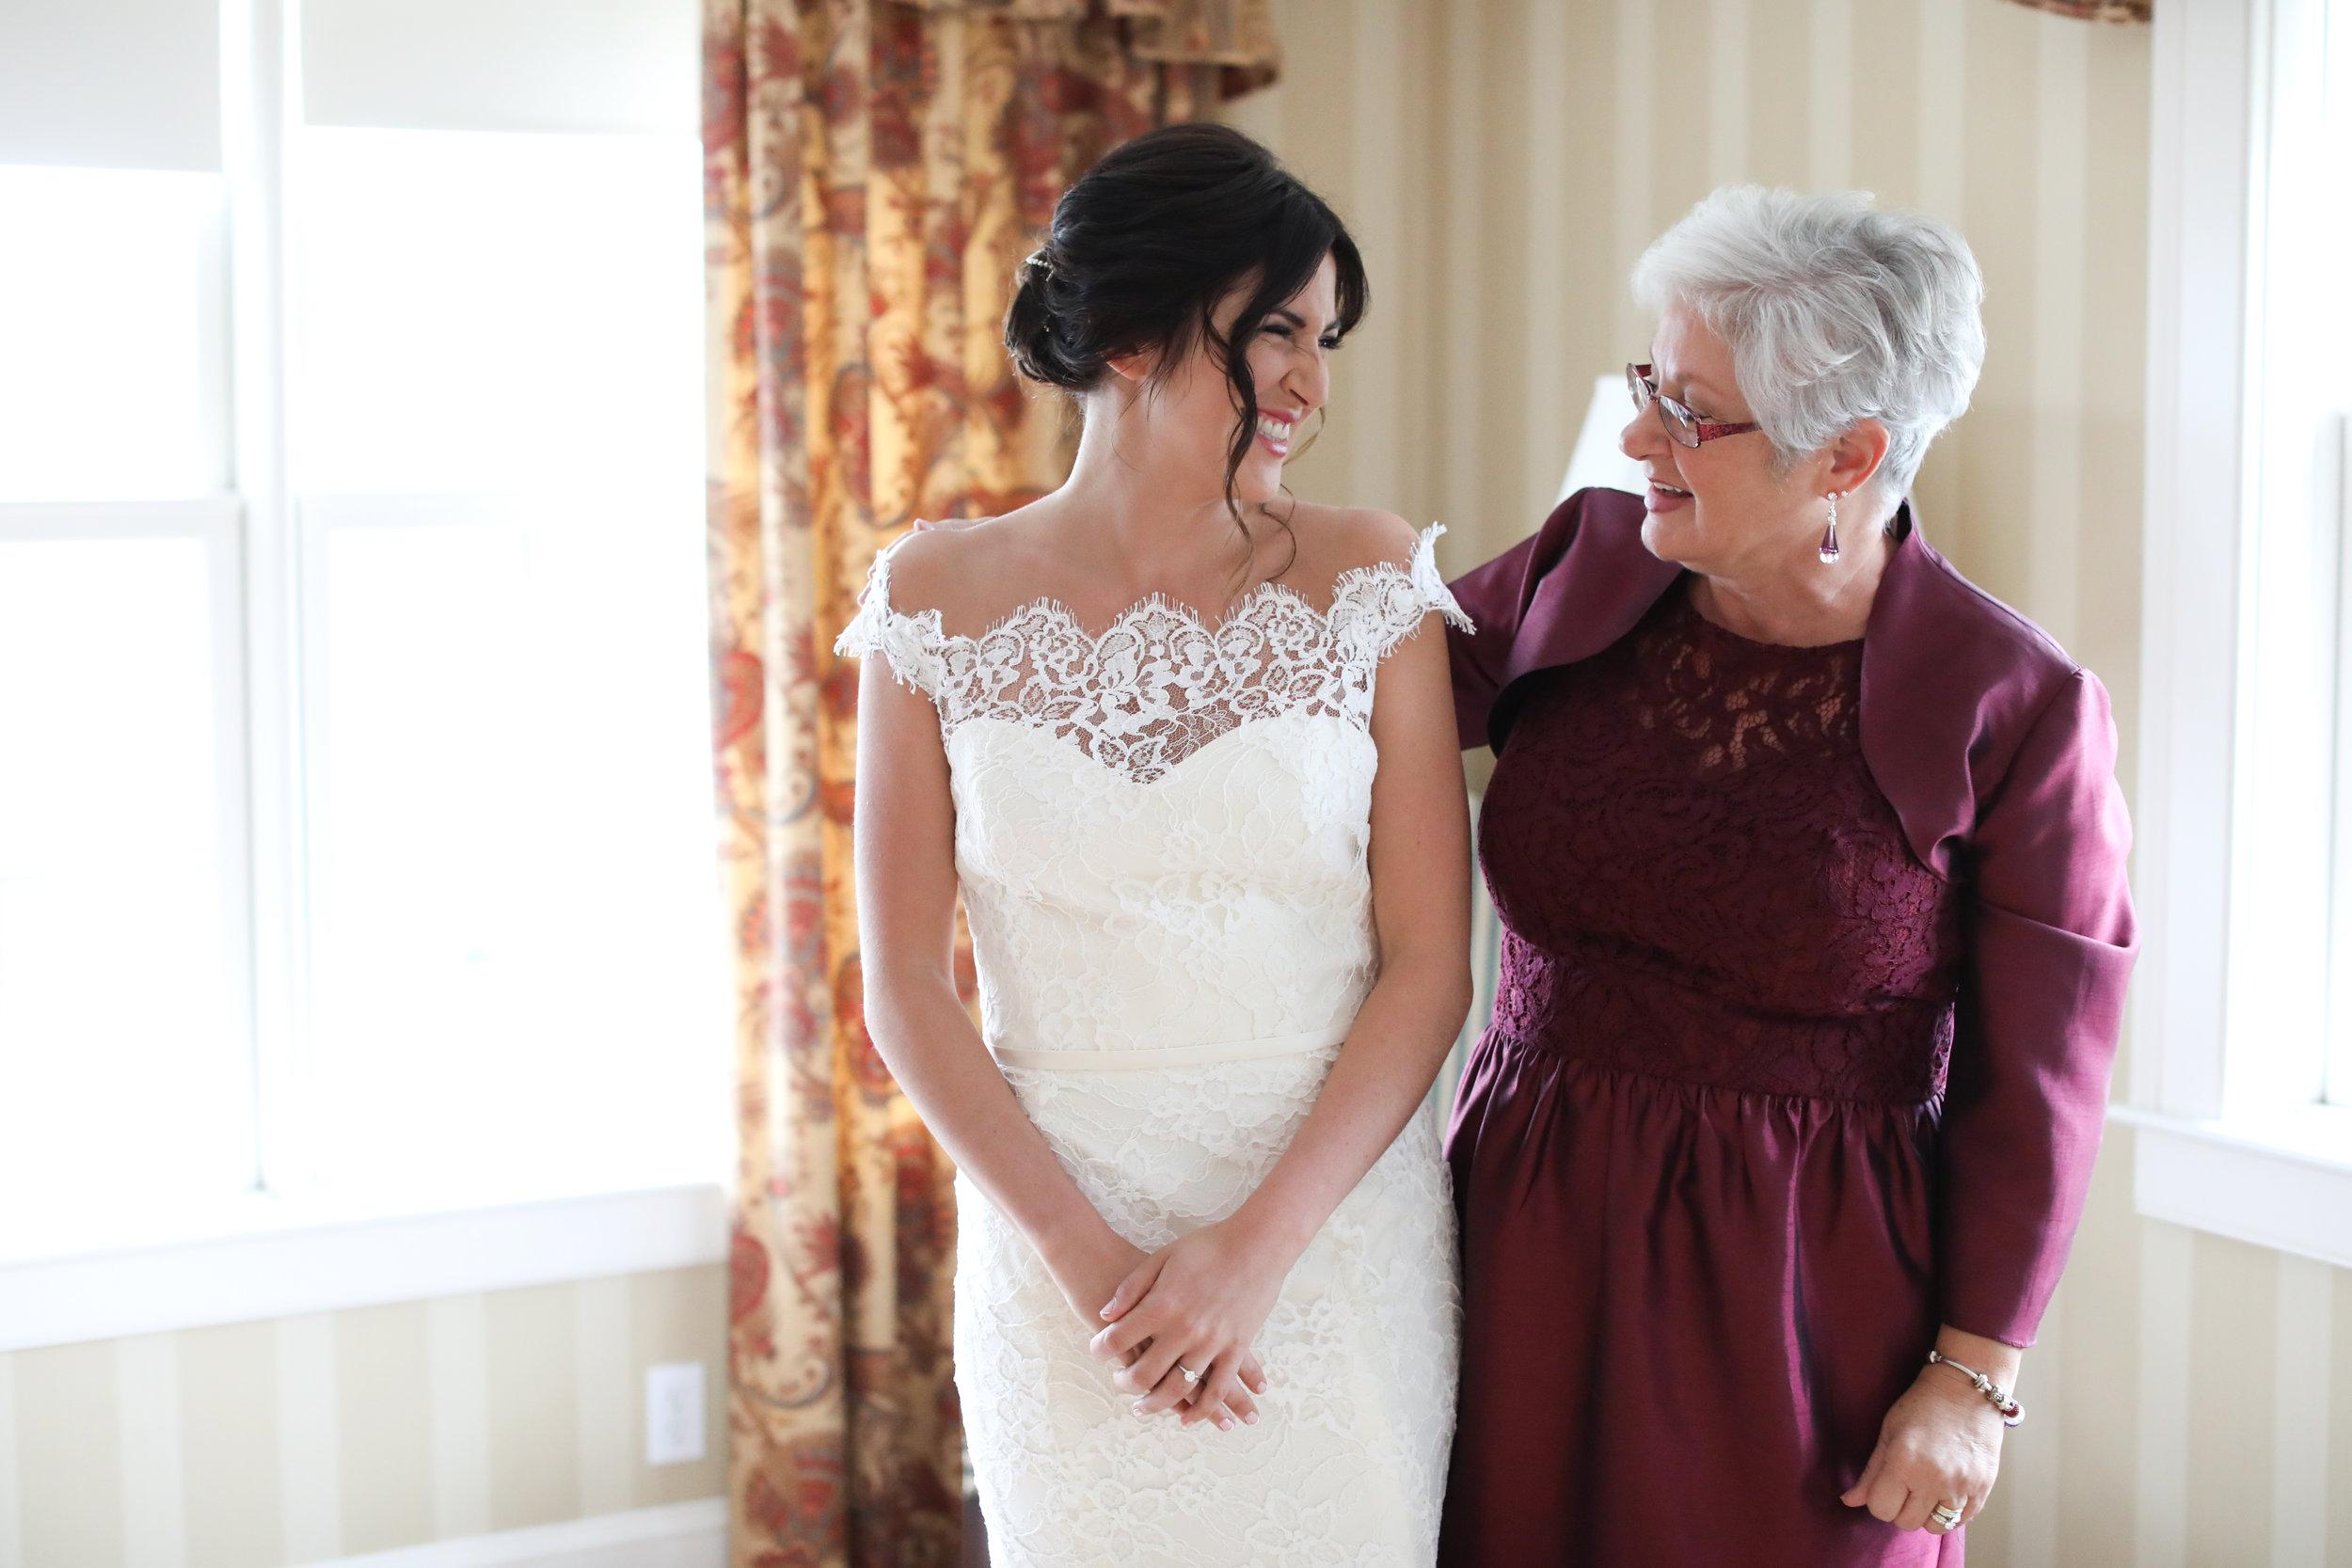 Lace Factory Wedding CT Wedding Planner - 19.jpg